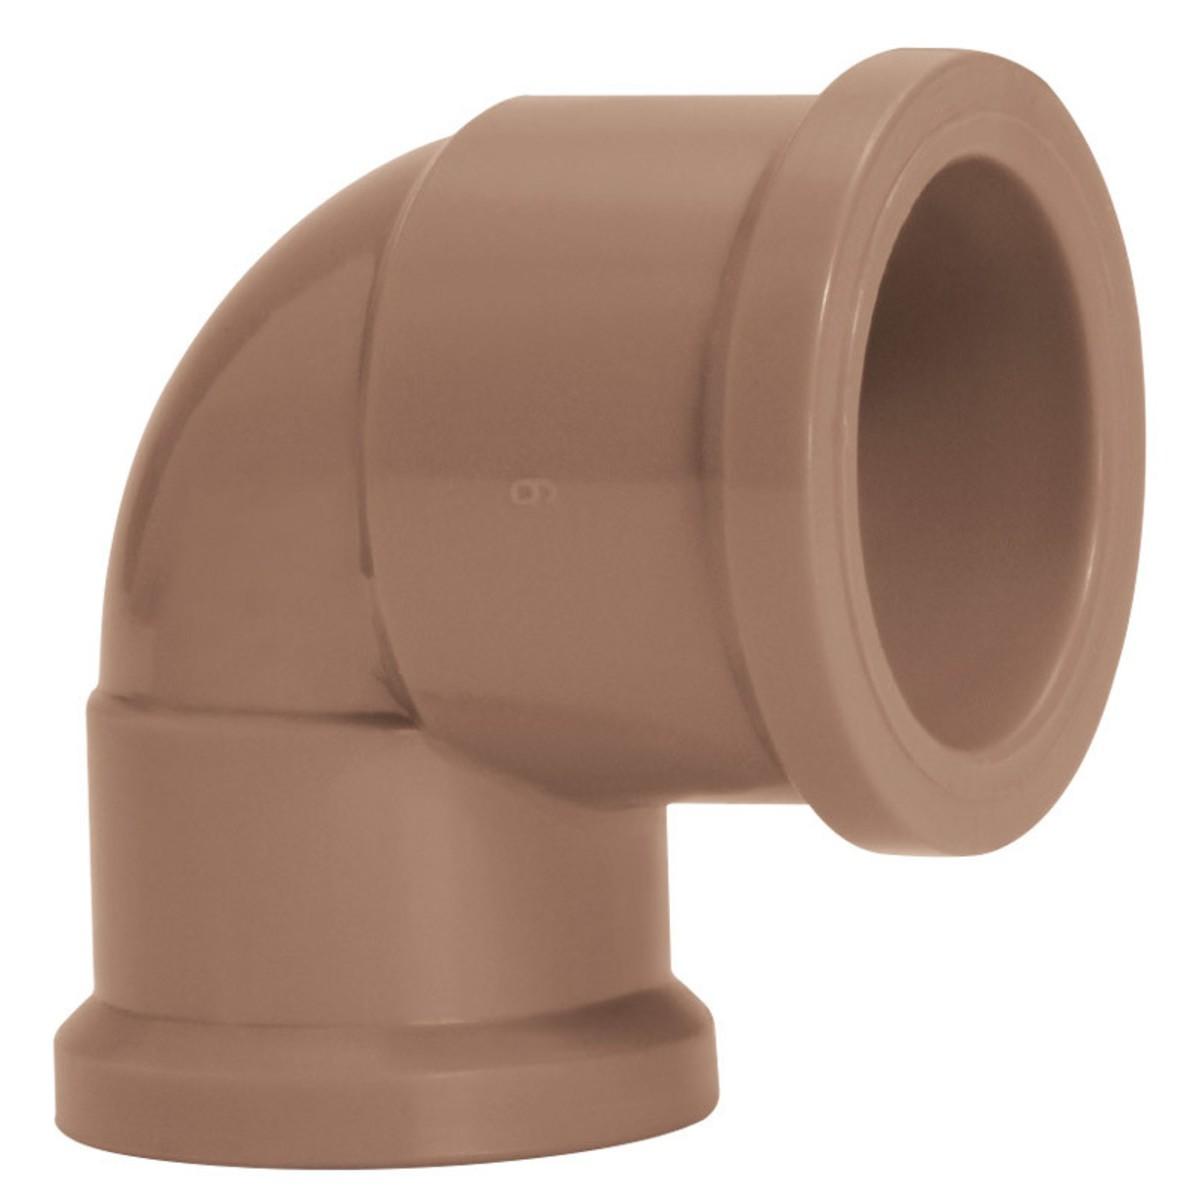 Joelho de Reducao 90 Soldavel PVC Marrom 25 mm x 20 mm - Amanco